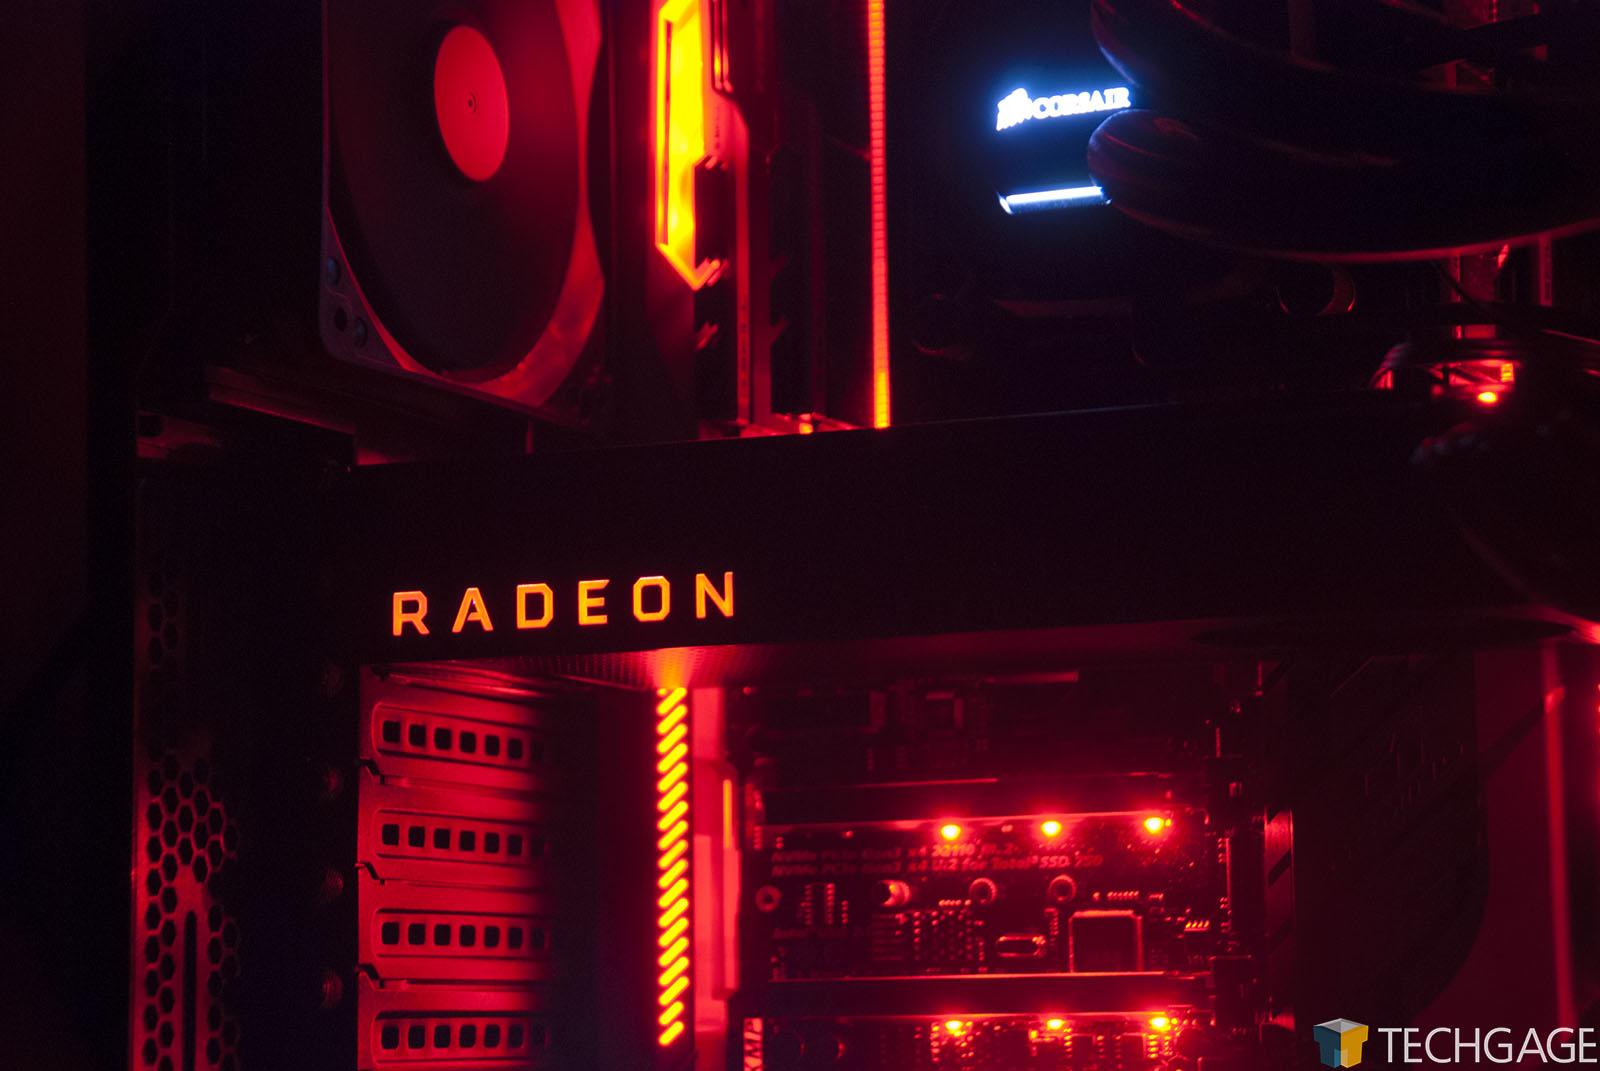 Radeon RX Vega 64 Workstation & Compute Performance | Page 4Techgage